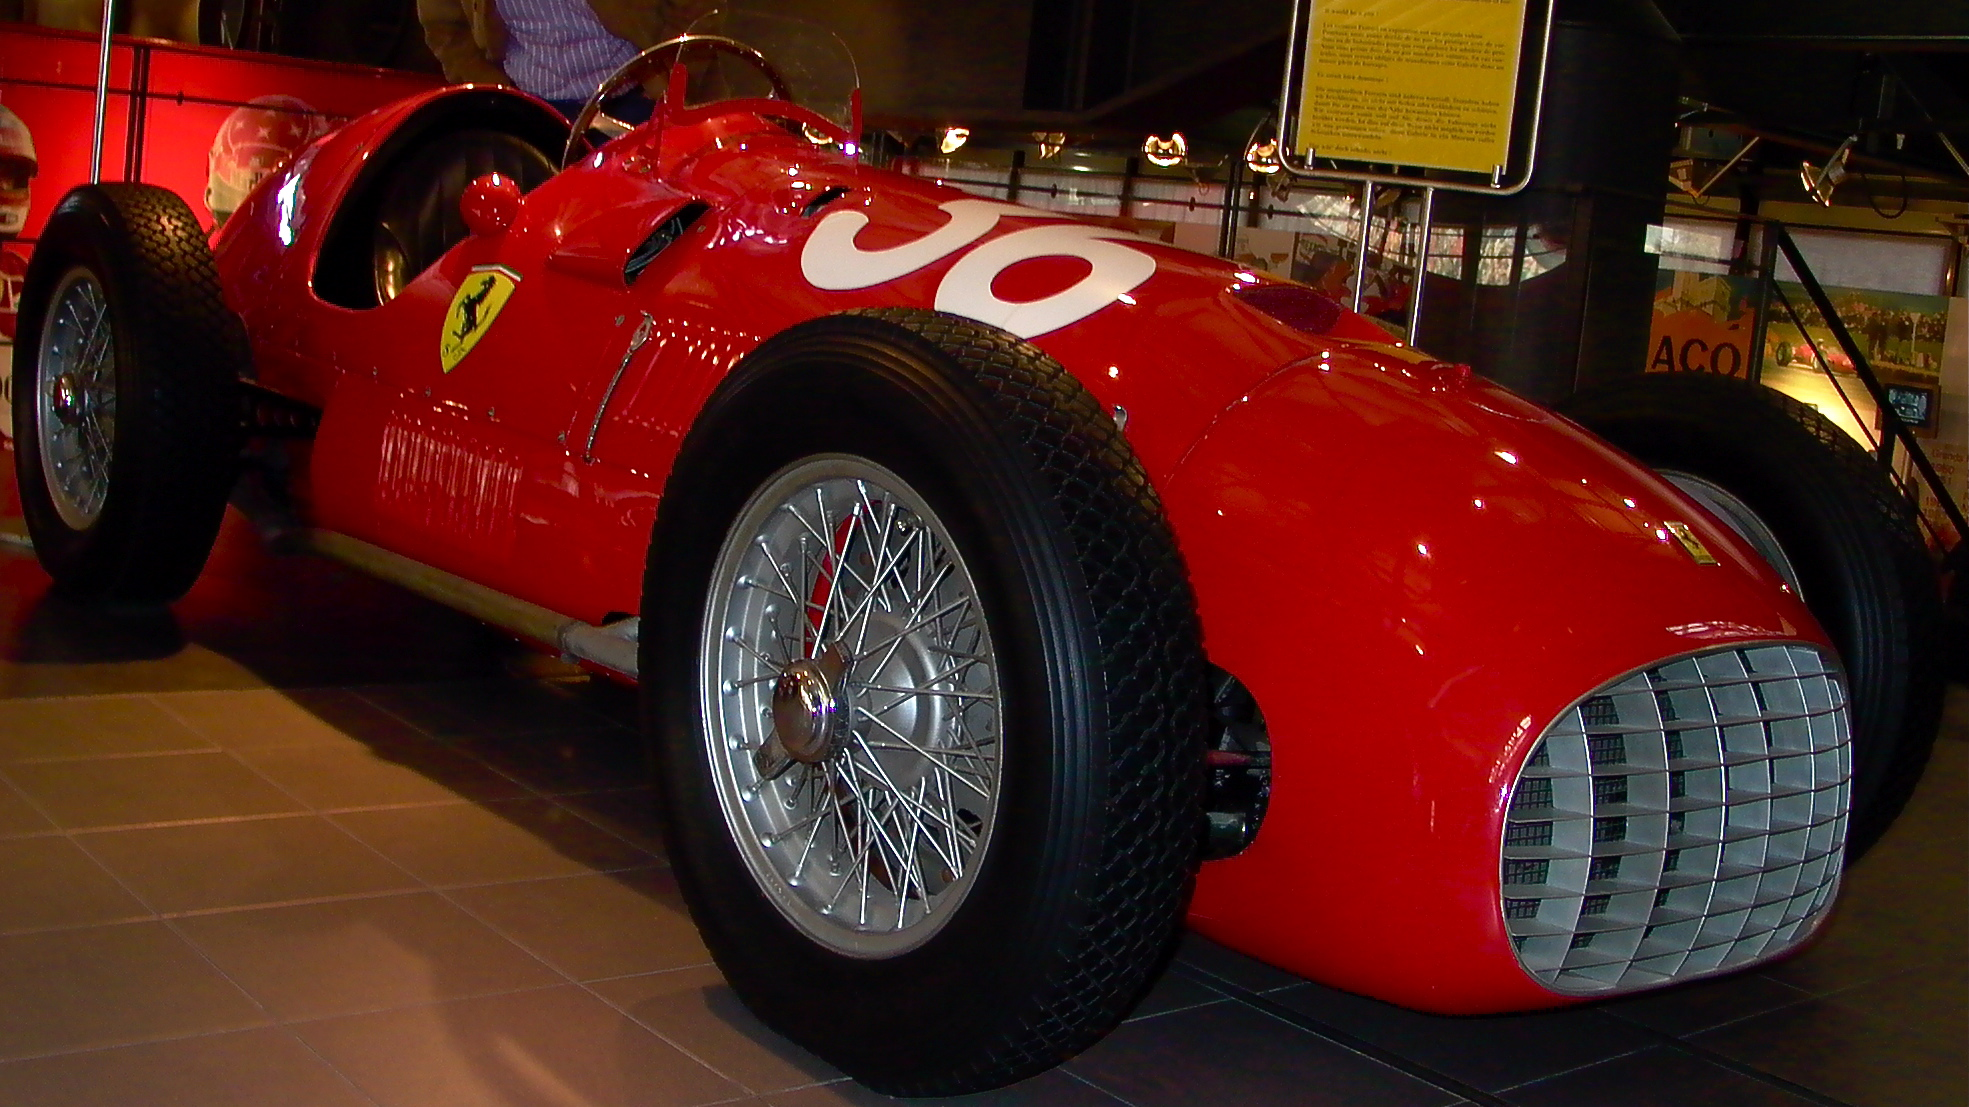 1951_Ferrari_375F1 Marvelous Photo Ferrari Mondial 8 Quattrovalvole Rouge Occasion Cars Trend